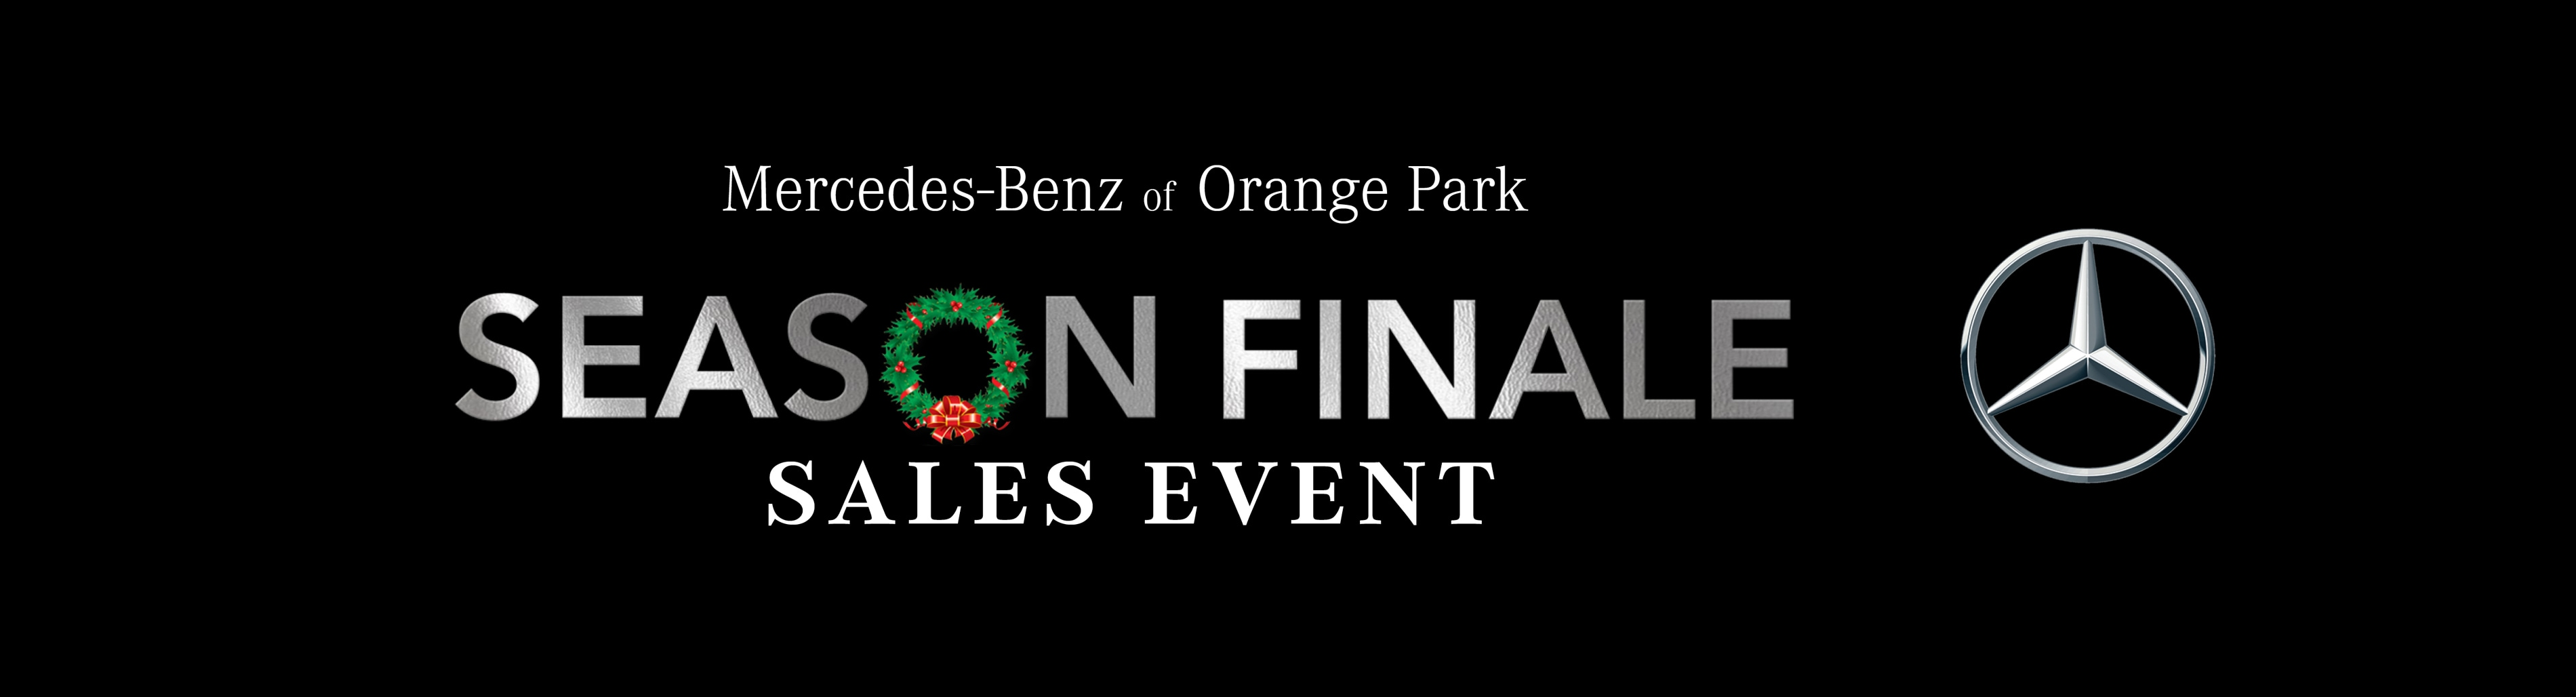 Top of mercedes benz parts jacksonville fl fiat world for Mercedes benz orange park fl